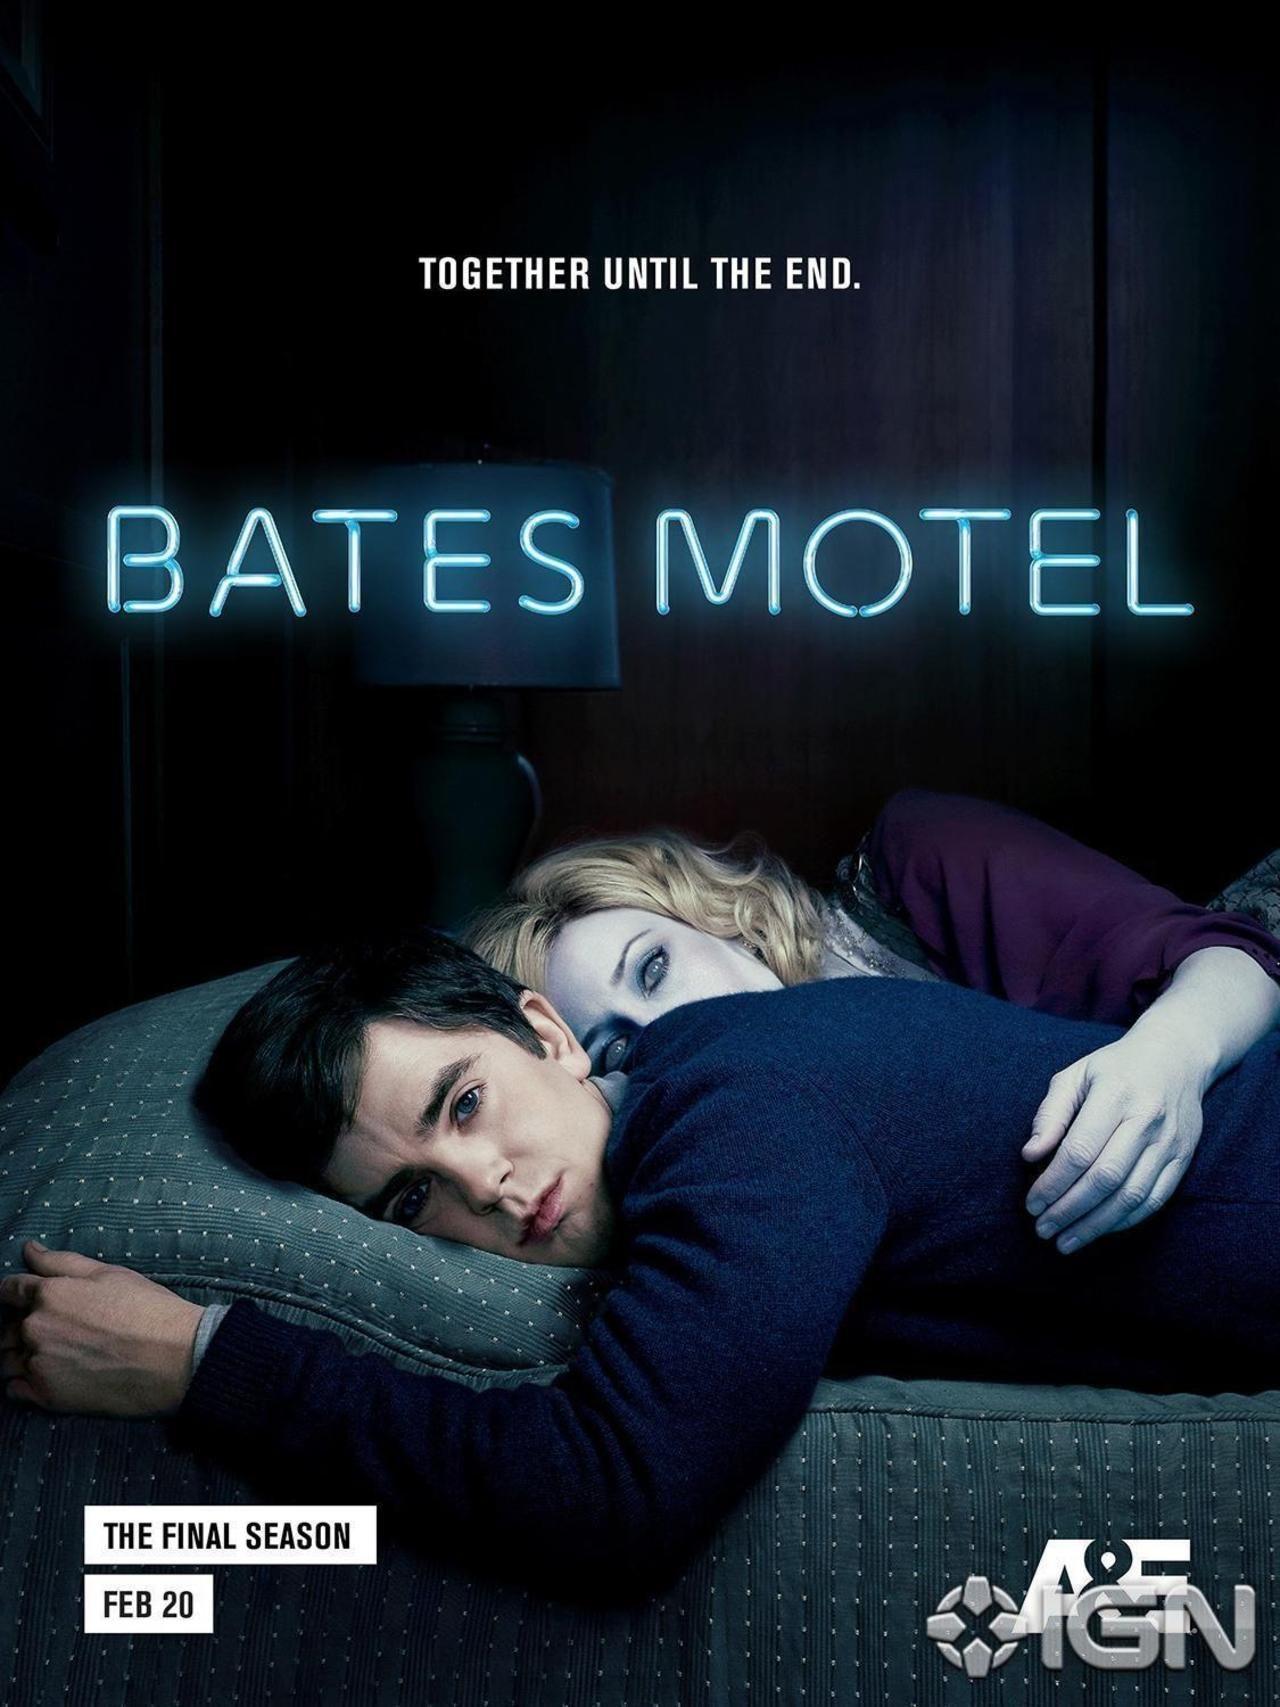 Bates Motel Google Search Bates Motel Bates Motel Season 5 Bates Motel Movie